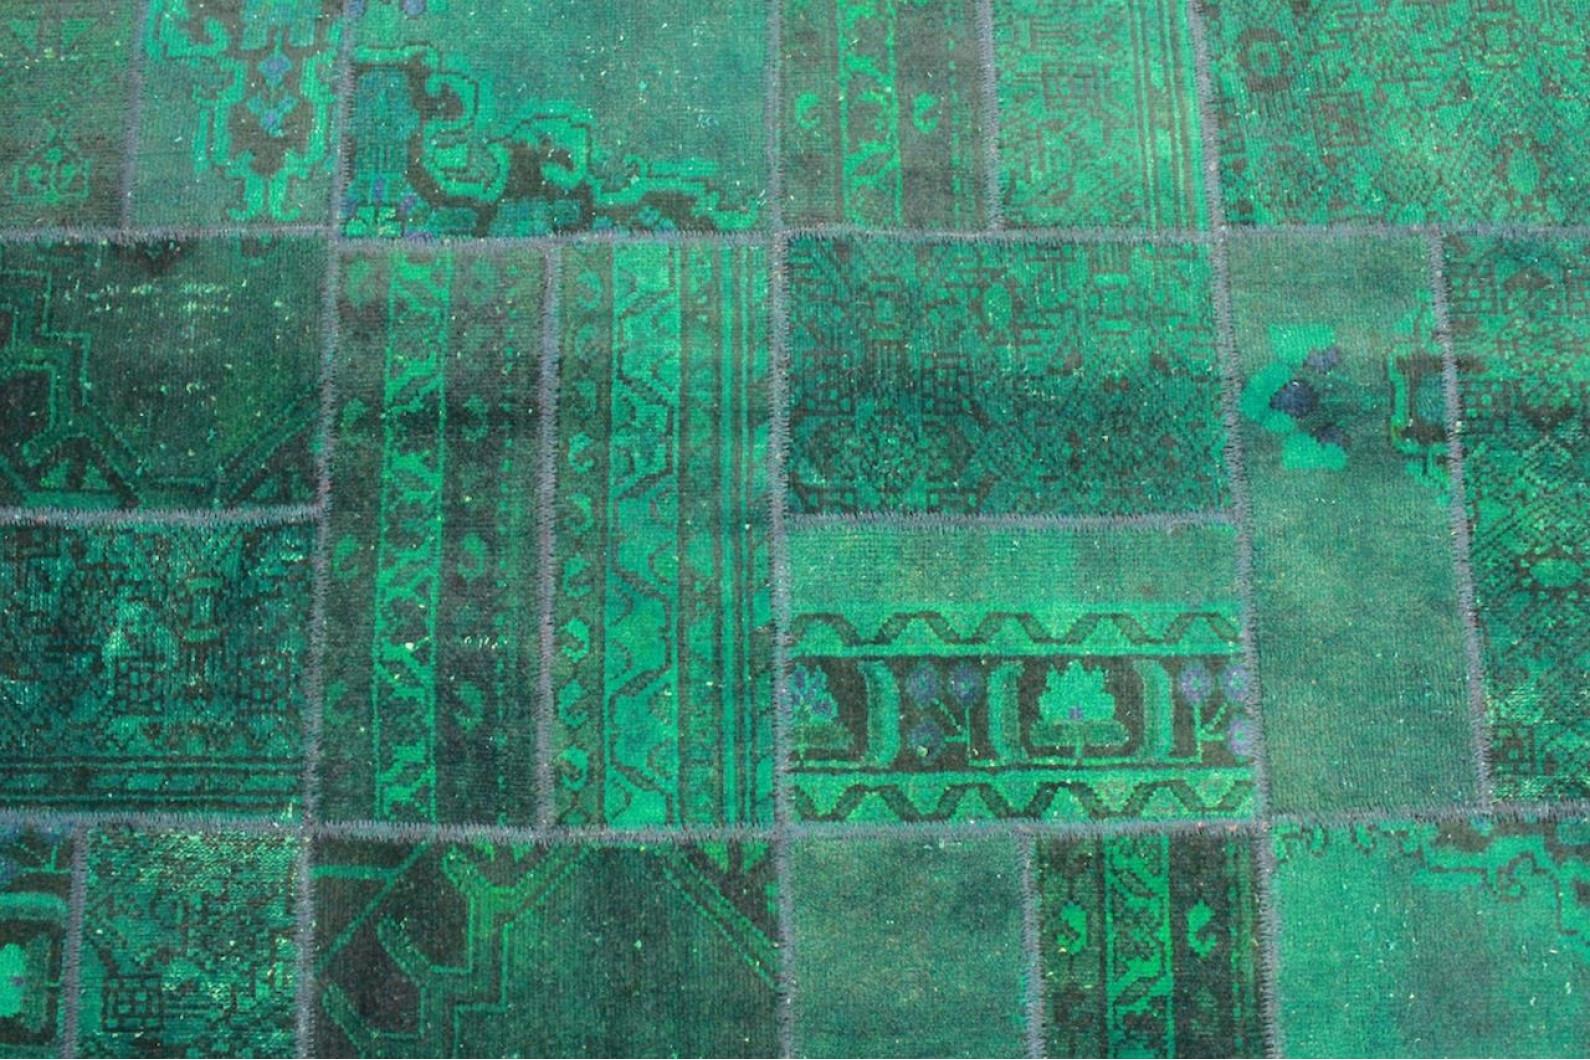 patchwork teppich gr n t rkis in 310x190cm 1001 1861 bei kaufen. Black Bedroom Furniture Sets. Home Design Ideas